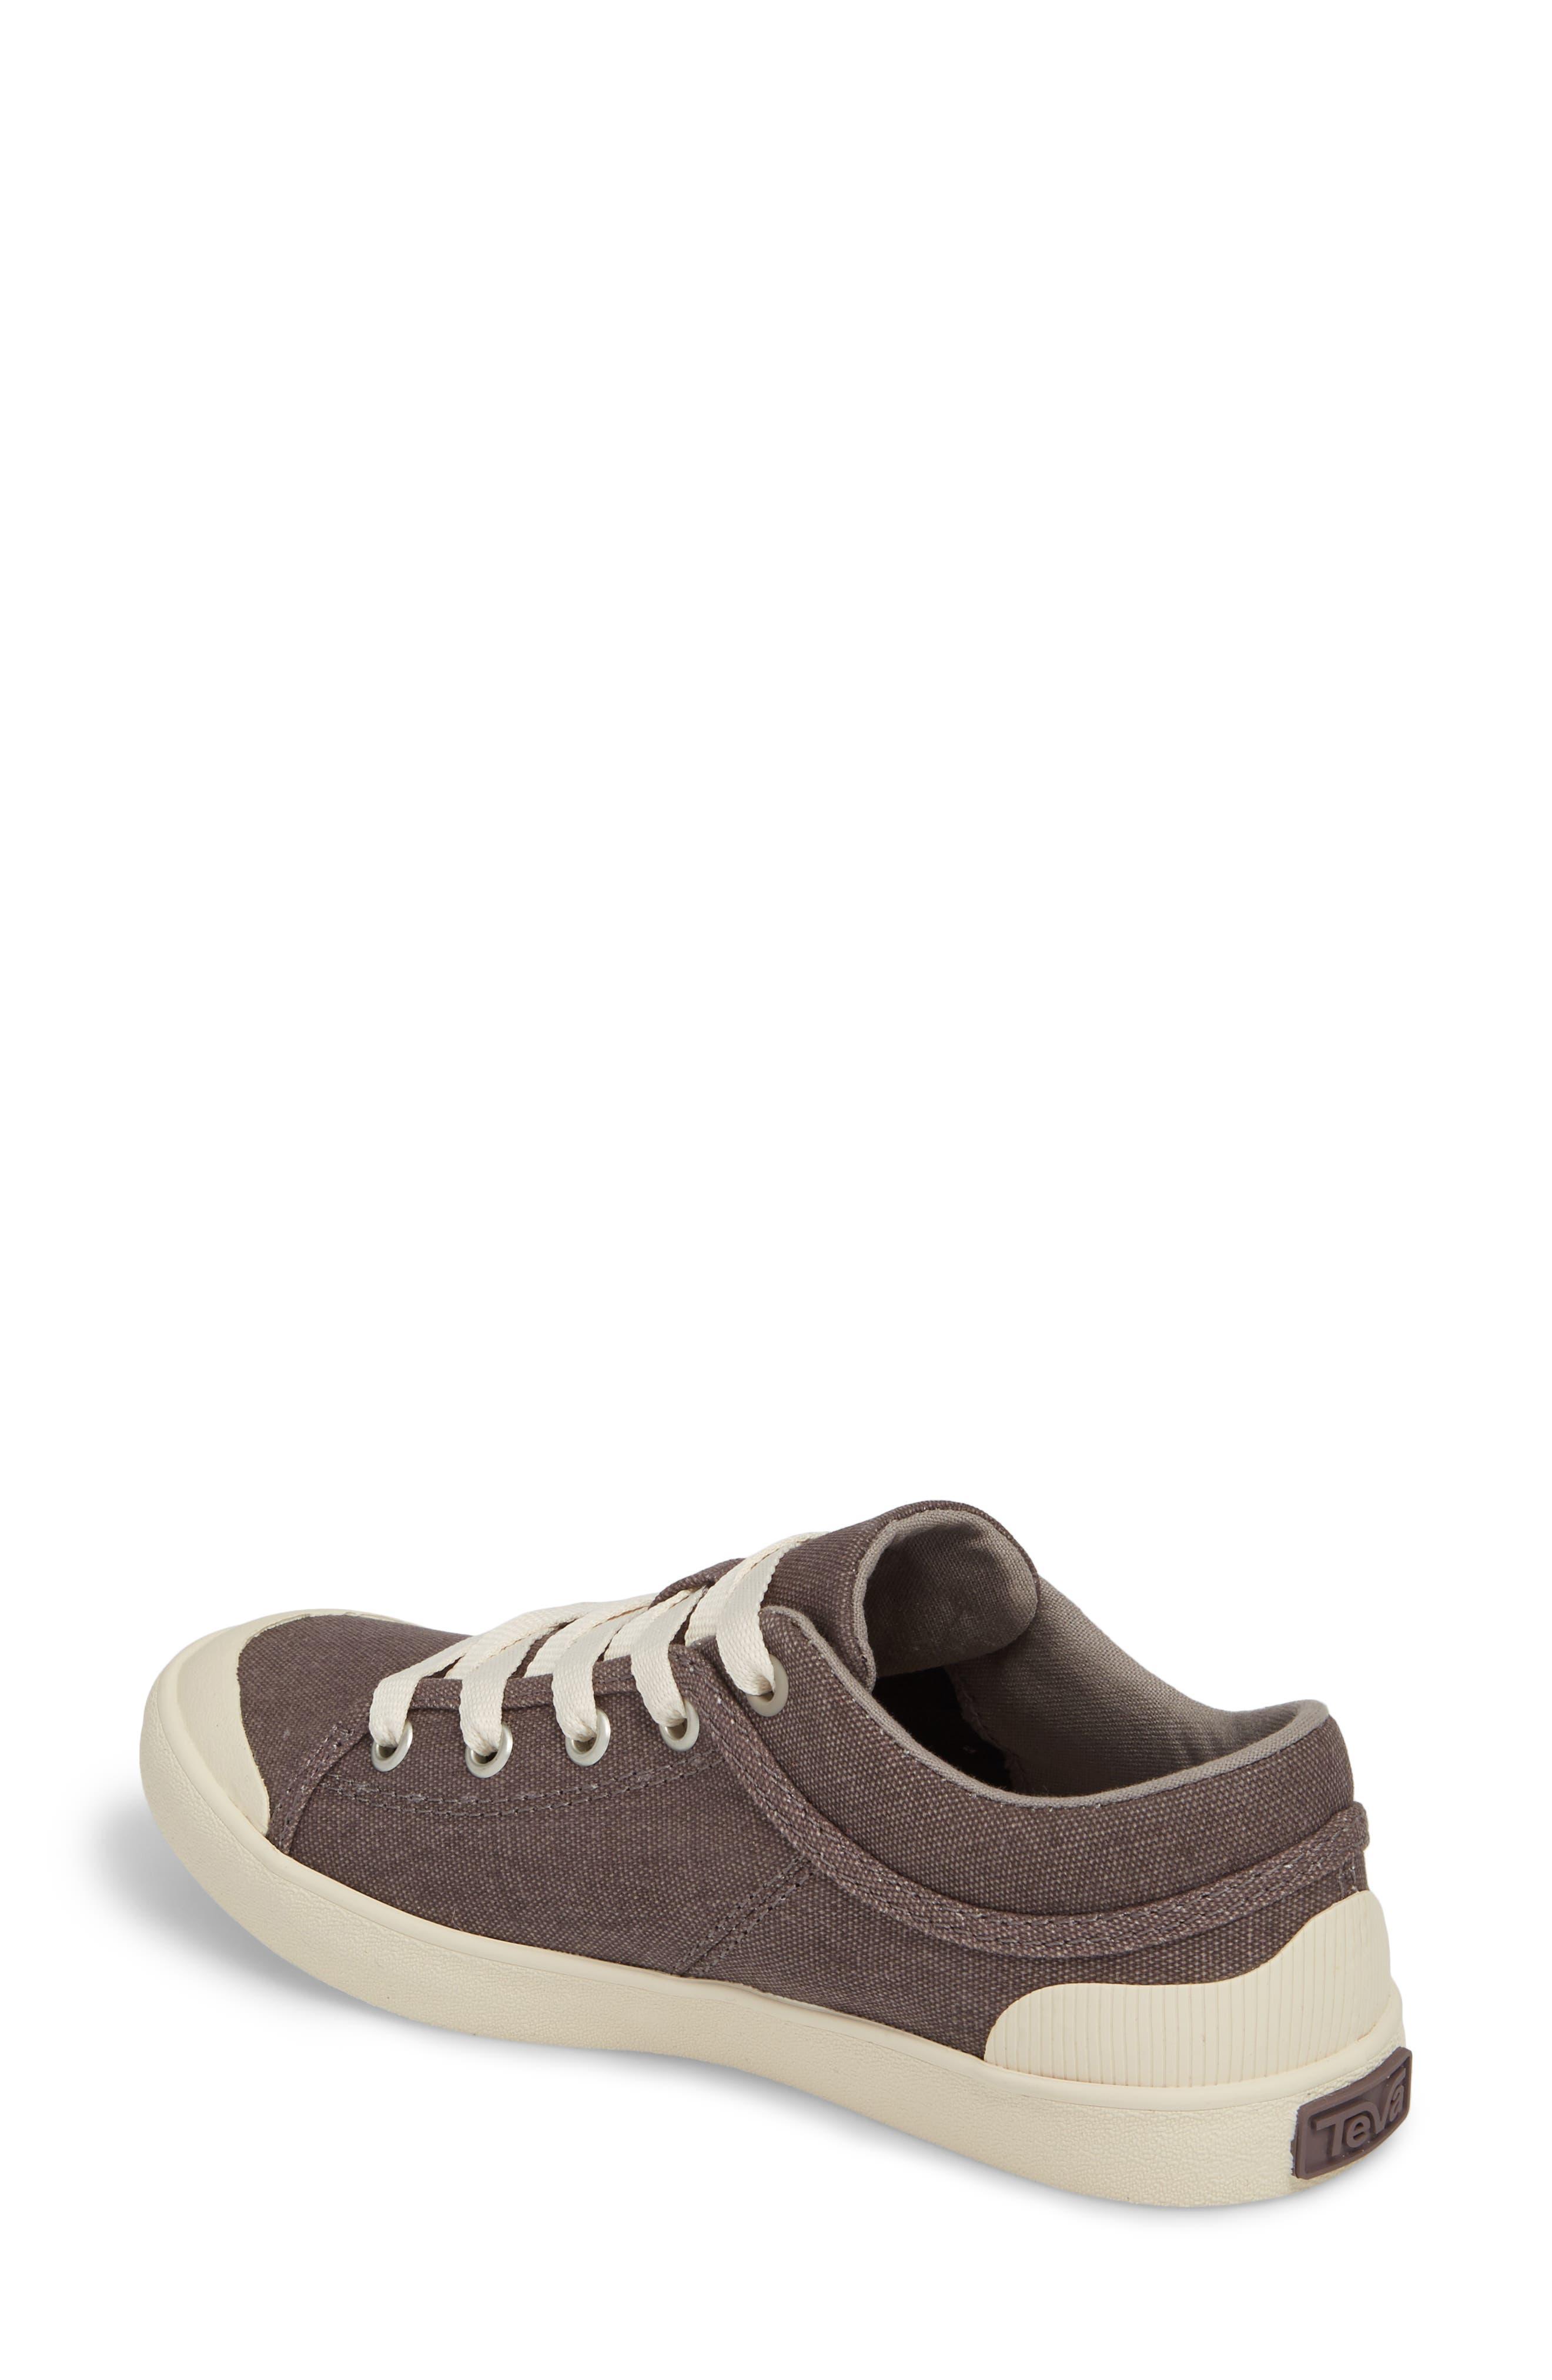 'Freewheel' Sneaker,                             Alternate thumbnail 2, color,                             Plum Truffle